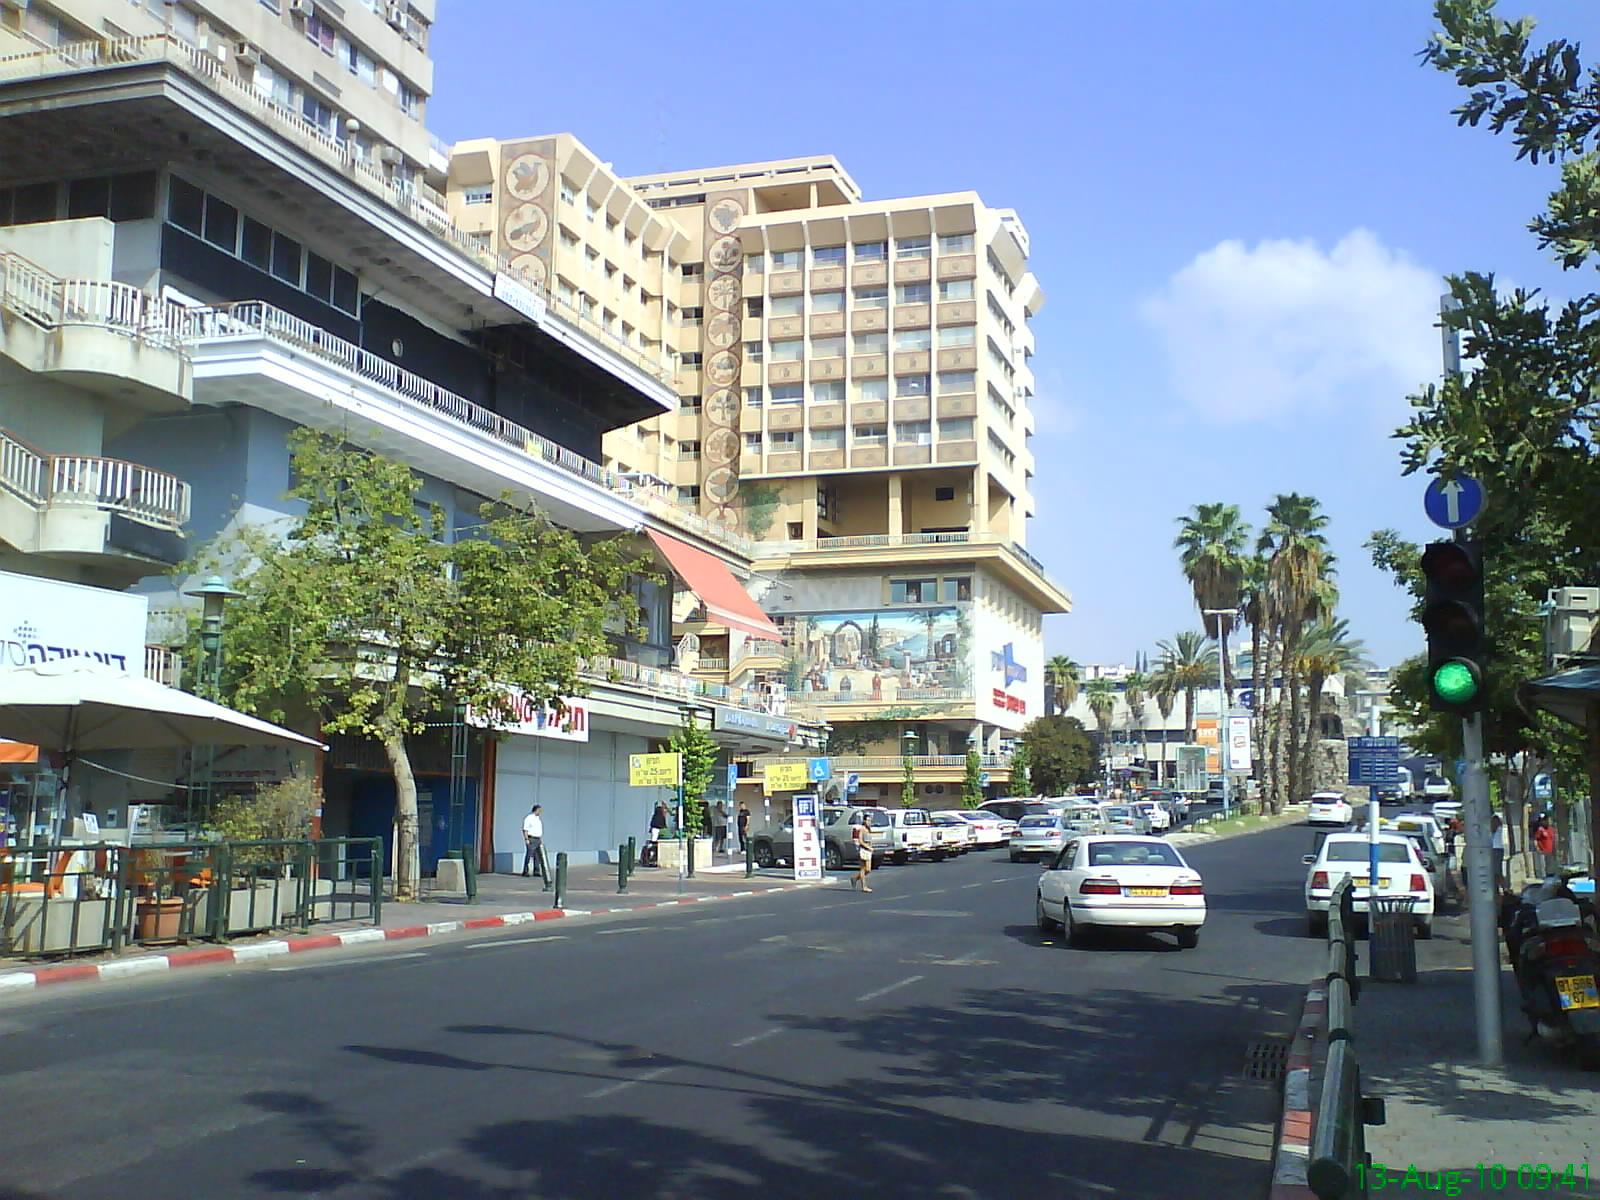 File:PikiWiki Israel 3943 Safed old city.jpg - Wikimedia